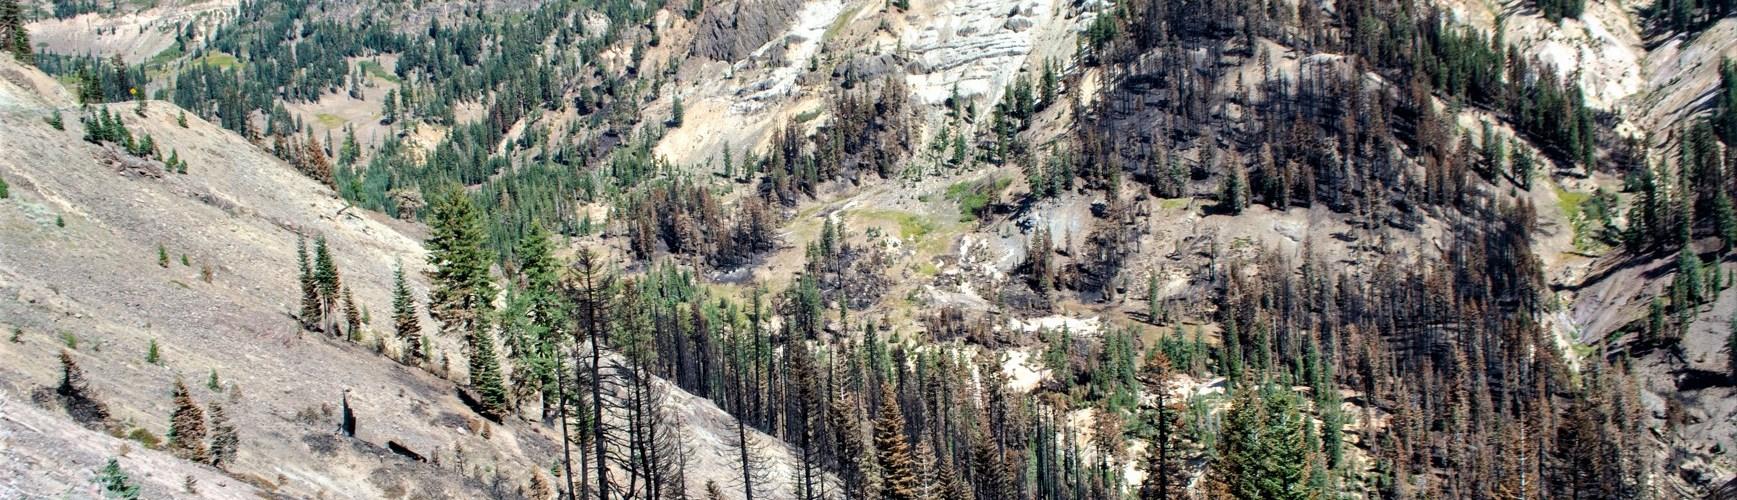 Little-Hot-Springs-Valley-and-Lassen-Peak